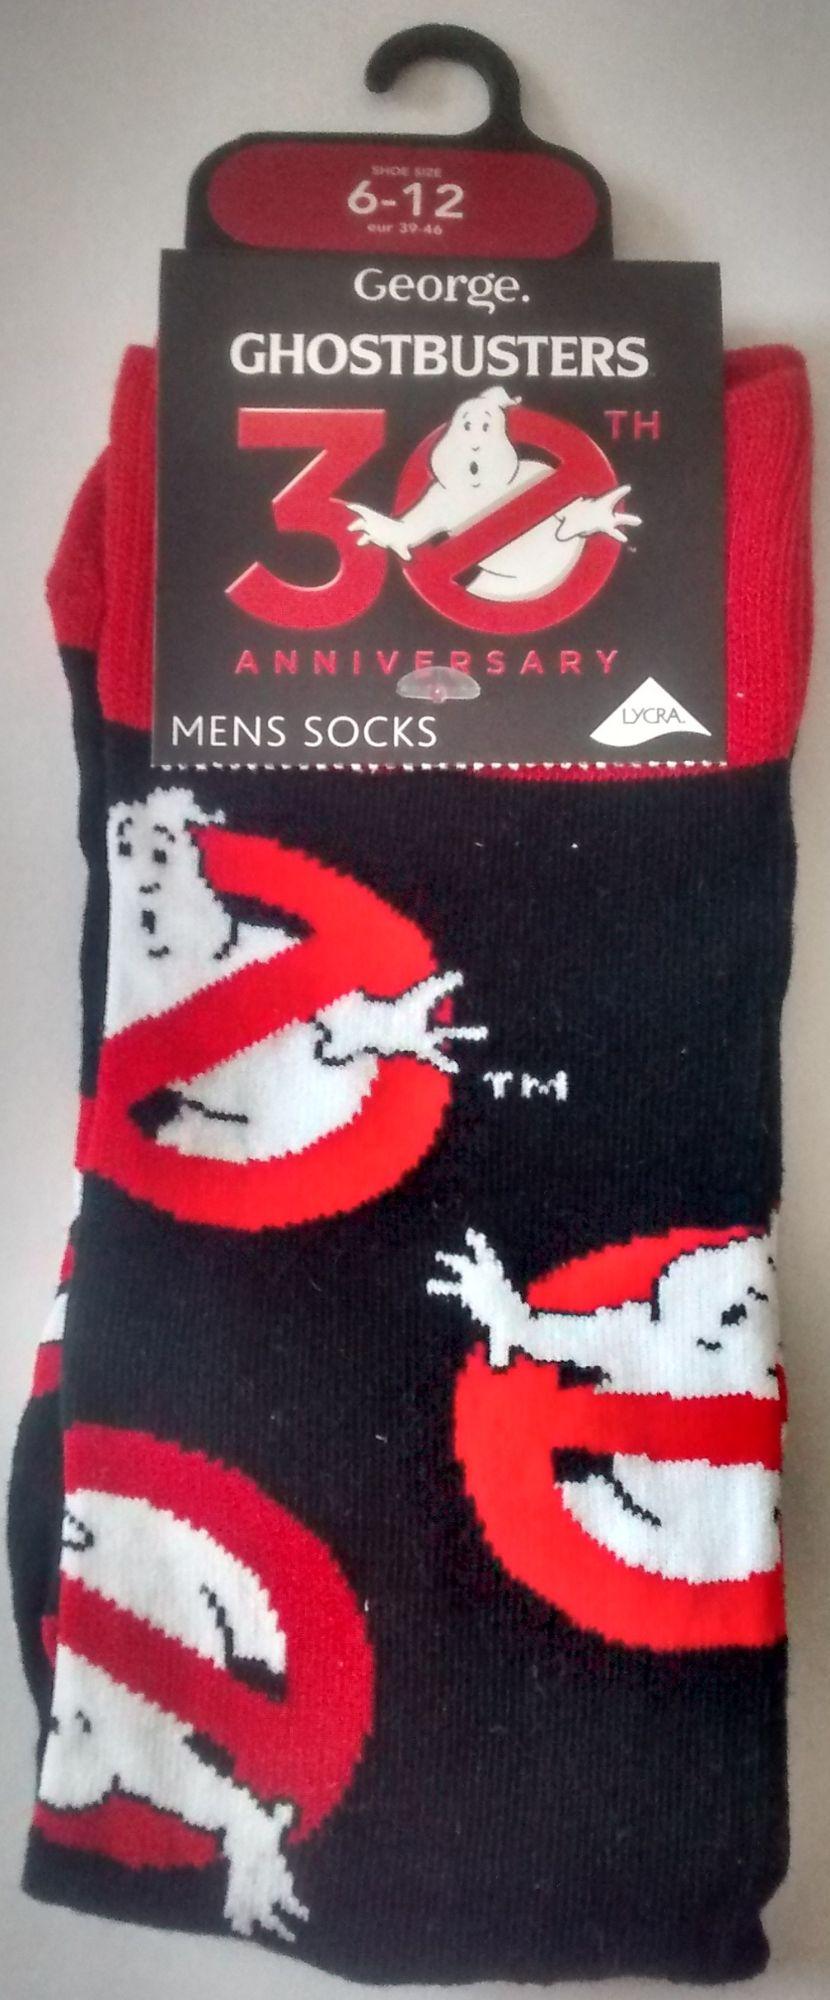 Ghostbusters Socks - Logo - Black - Mens UK 6-12